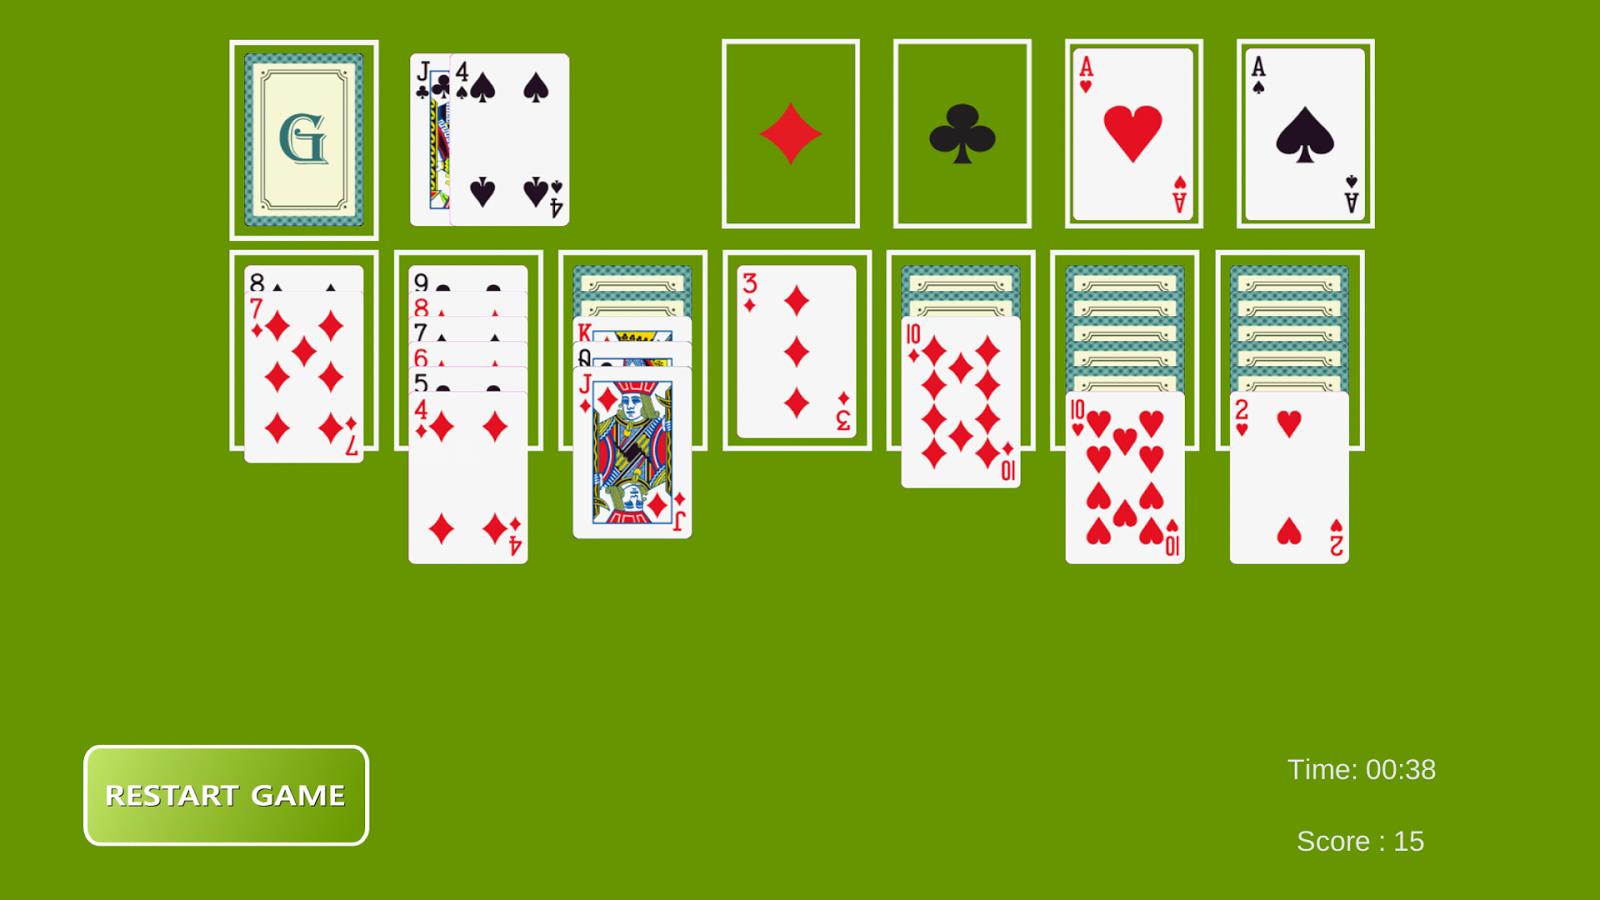 Ace games casino 10